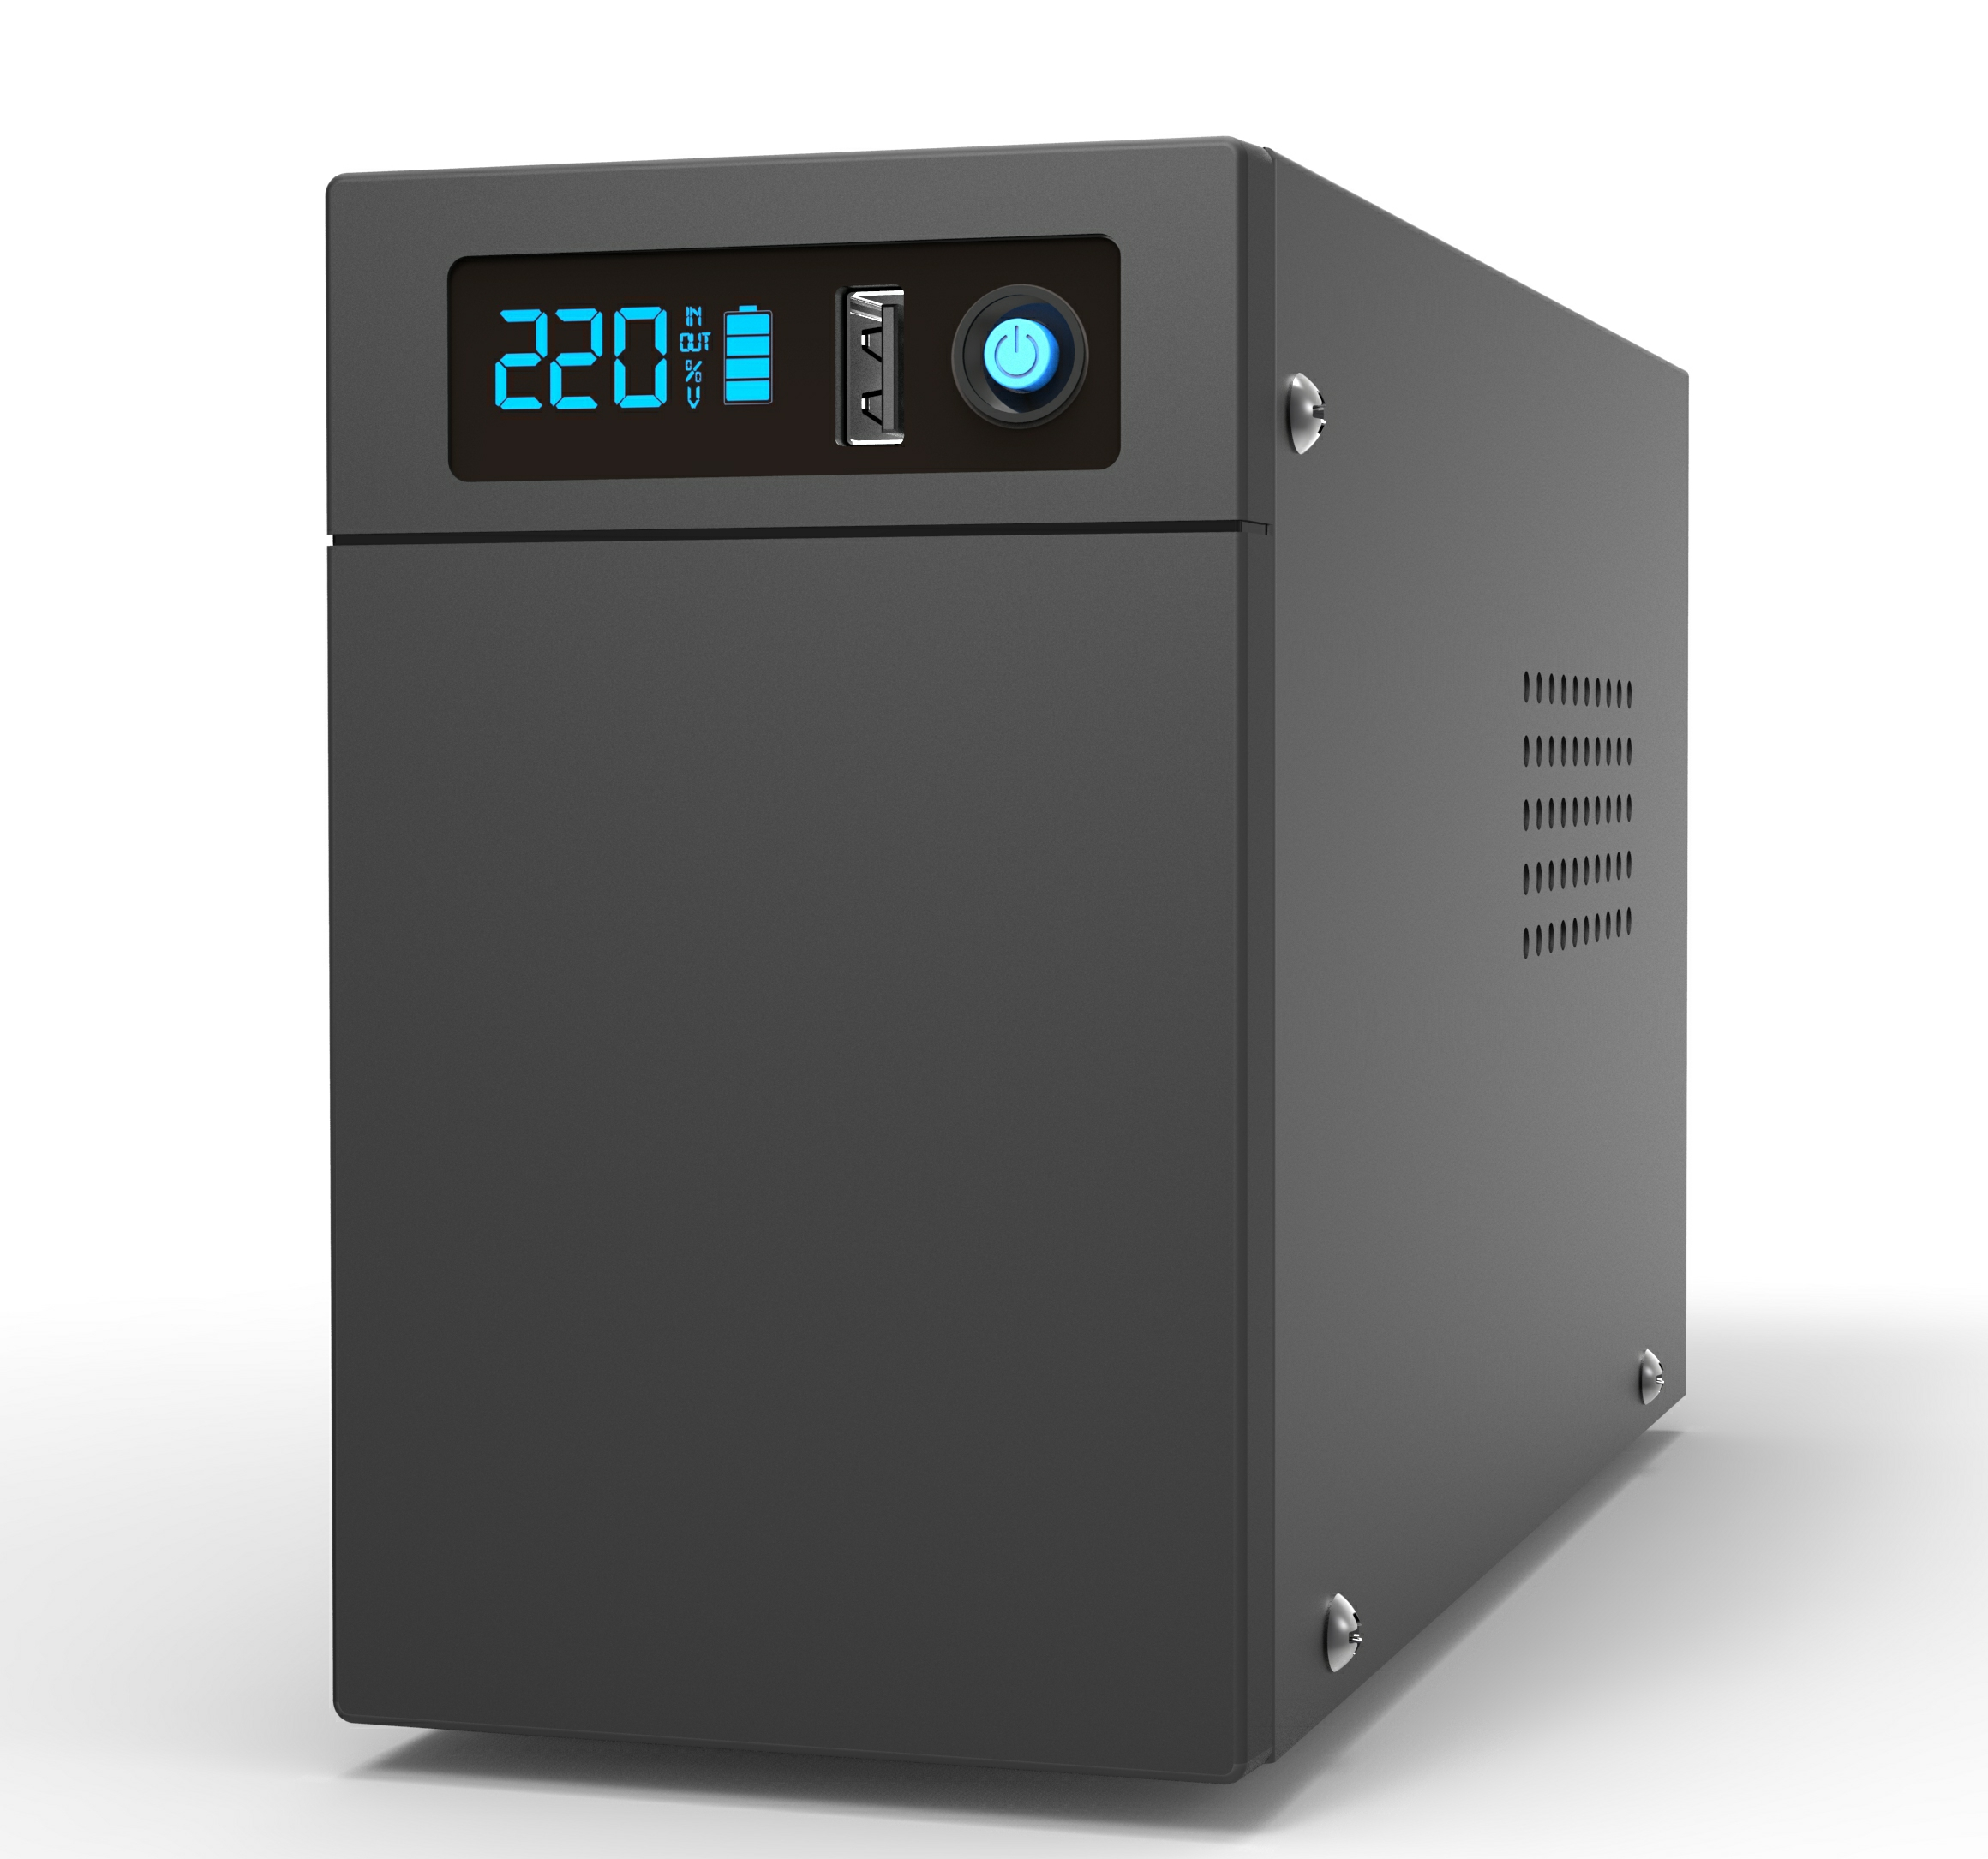 600V UPS with USB